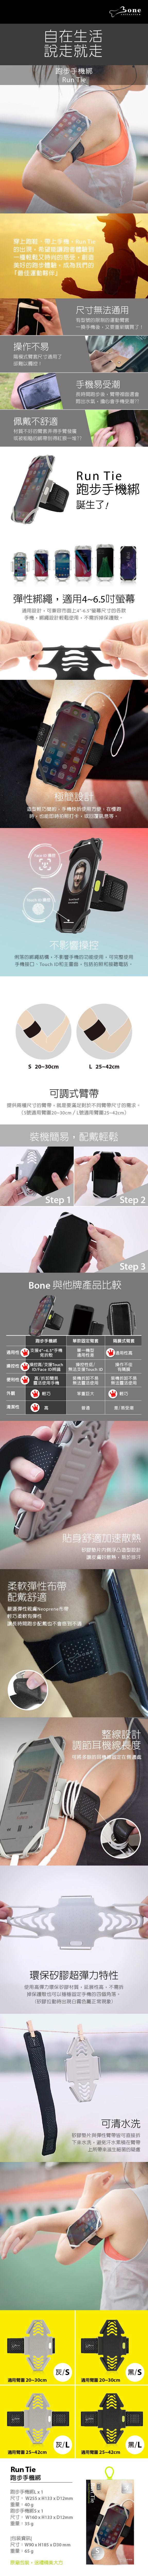 Bone│跑步手機綁 Run Tie - 通用運動臂套